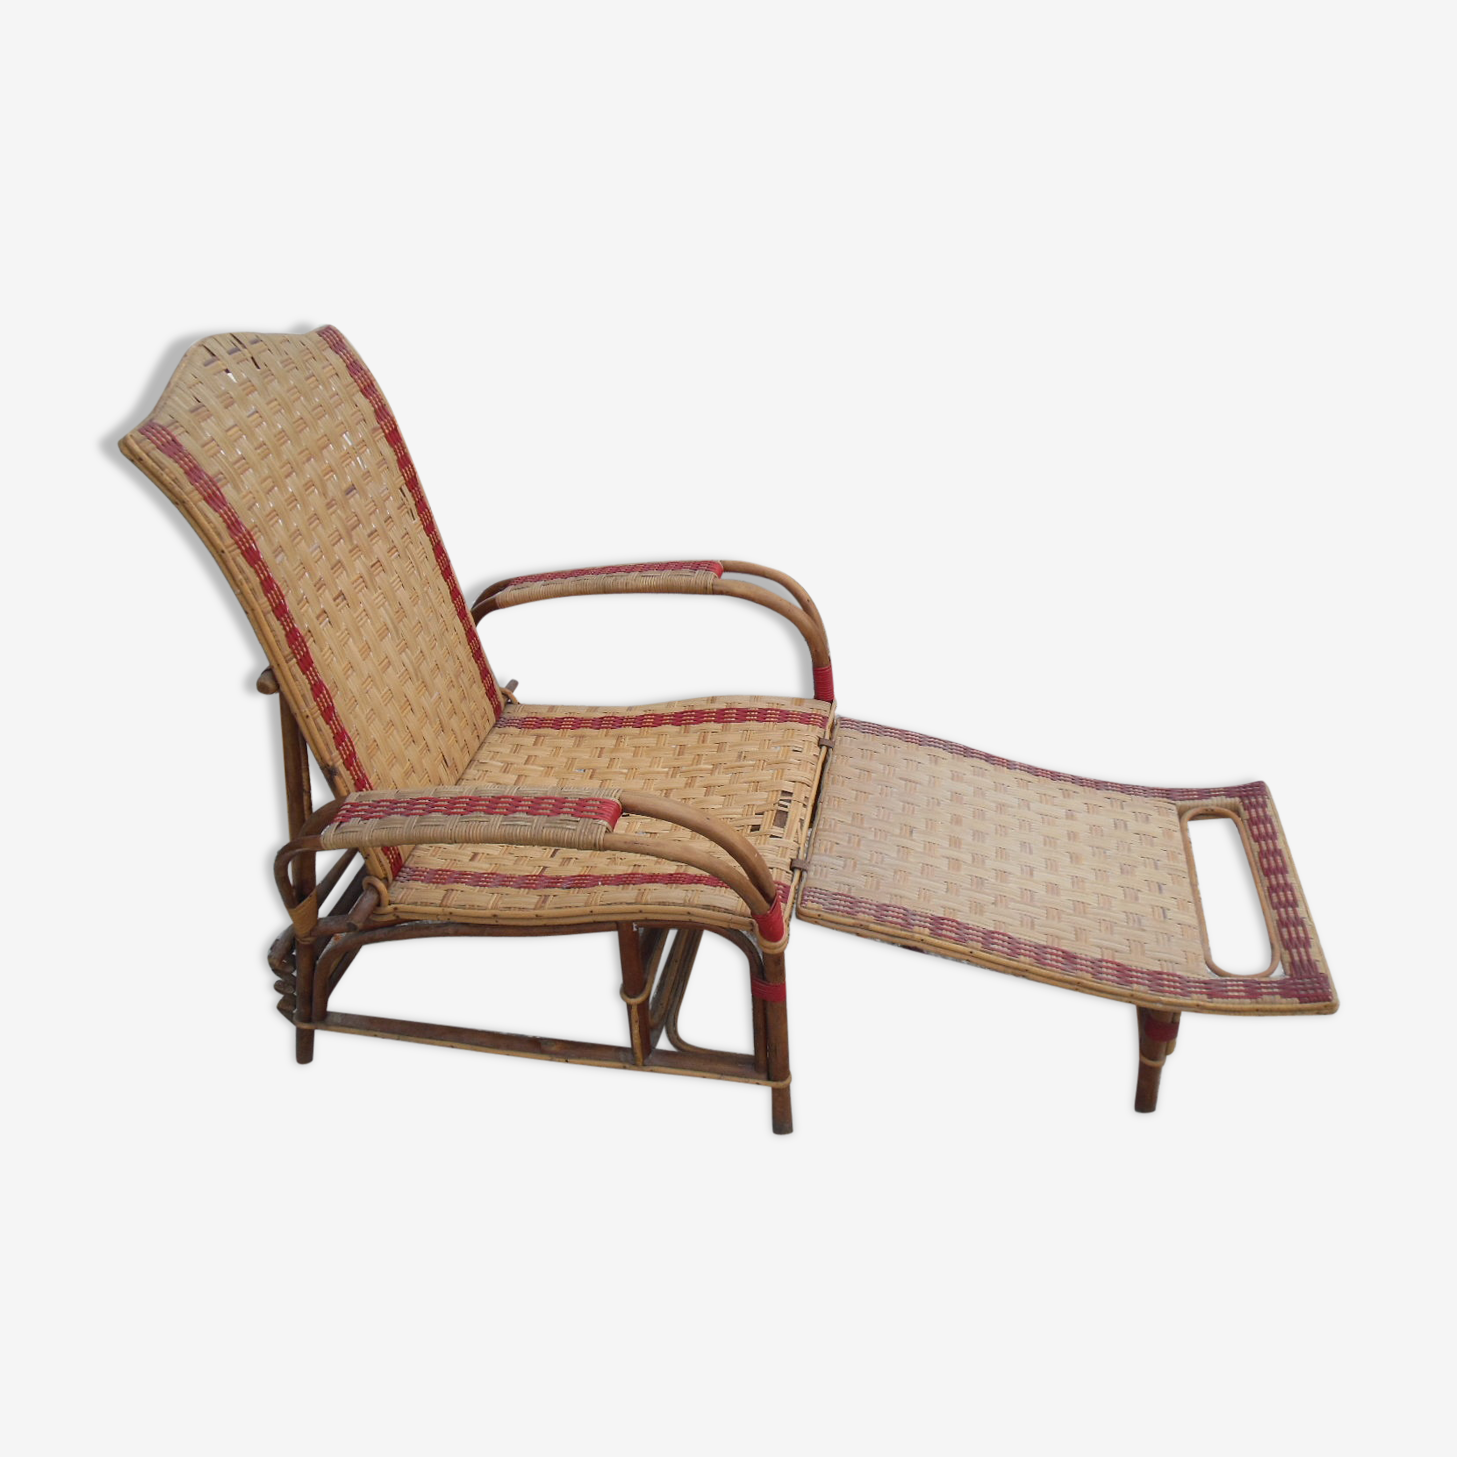 Fauteuil chaise longue en rotin